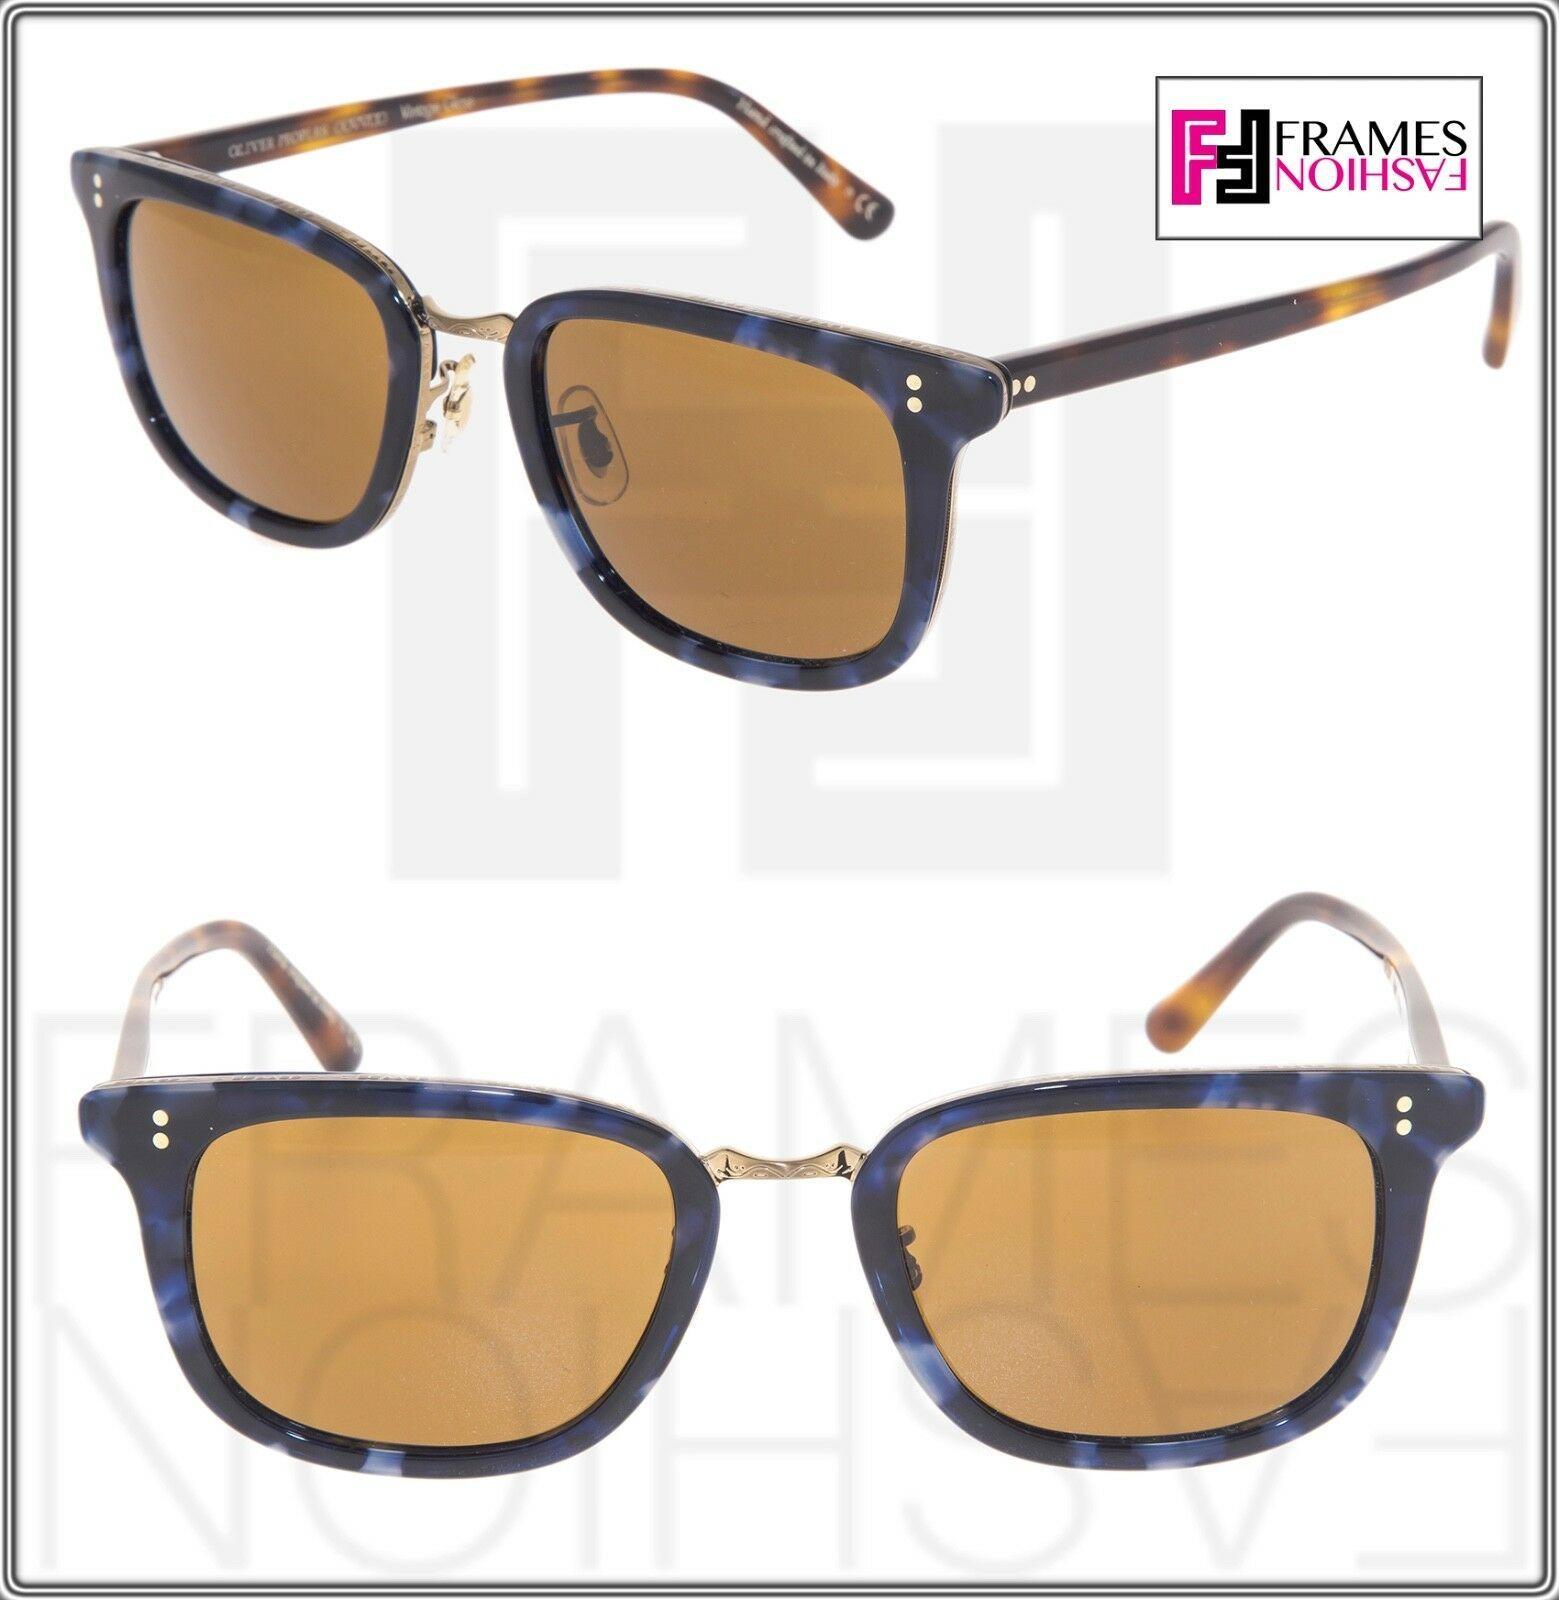 OLIVER PEOPLES KETTNER OV5339S Brown Blue Tortoise Cosmik Sunglasses 5339